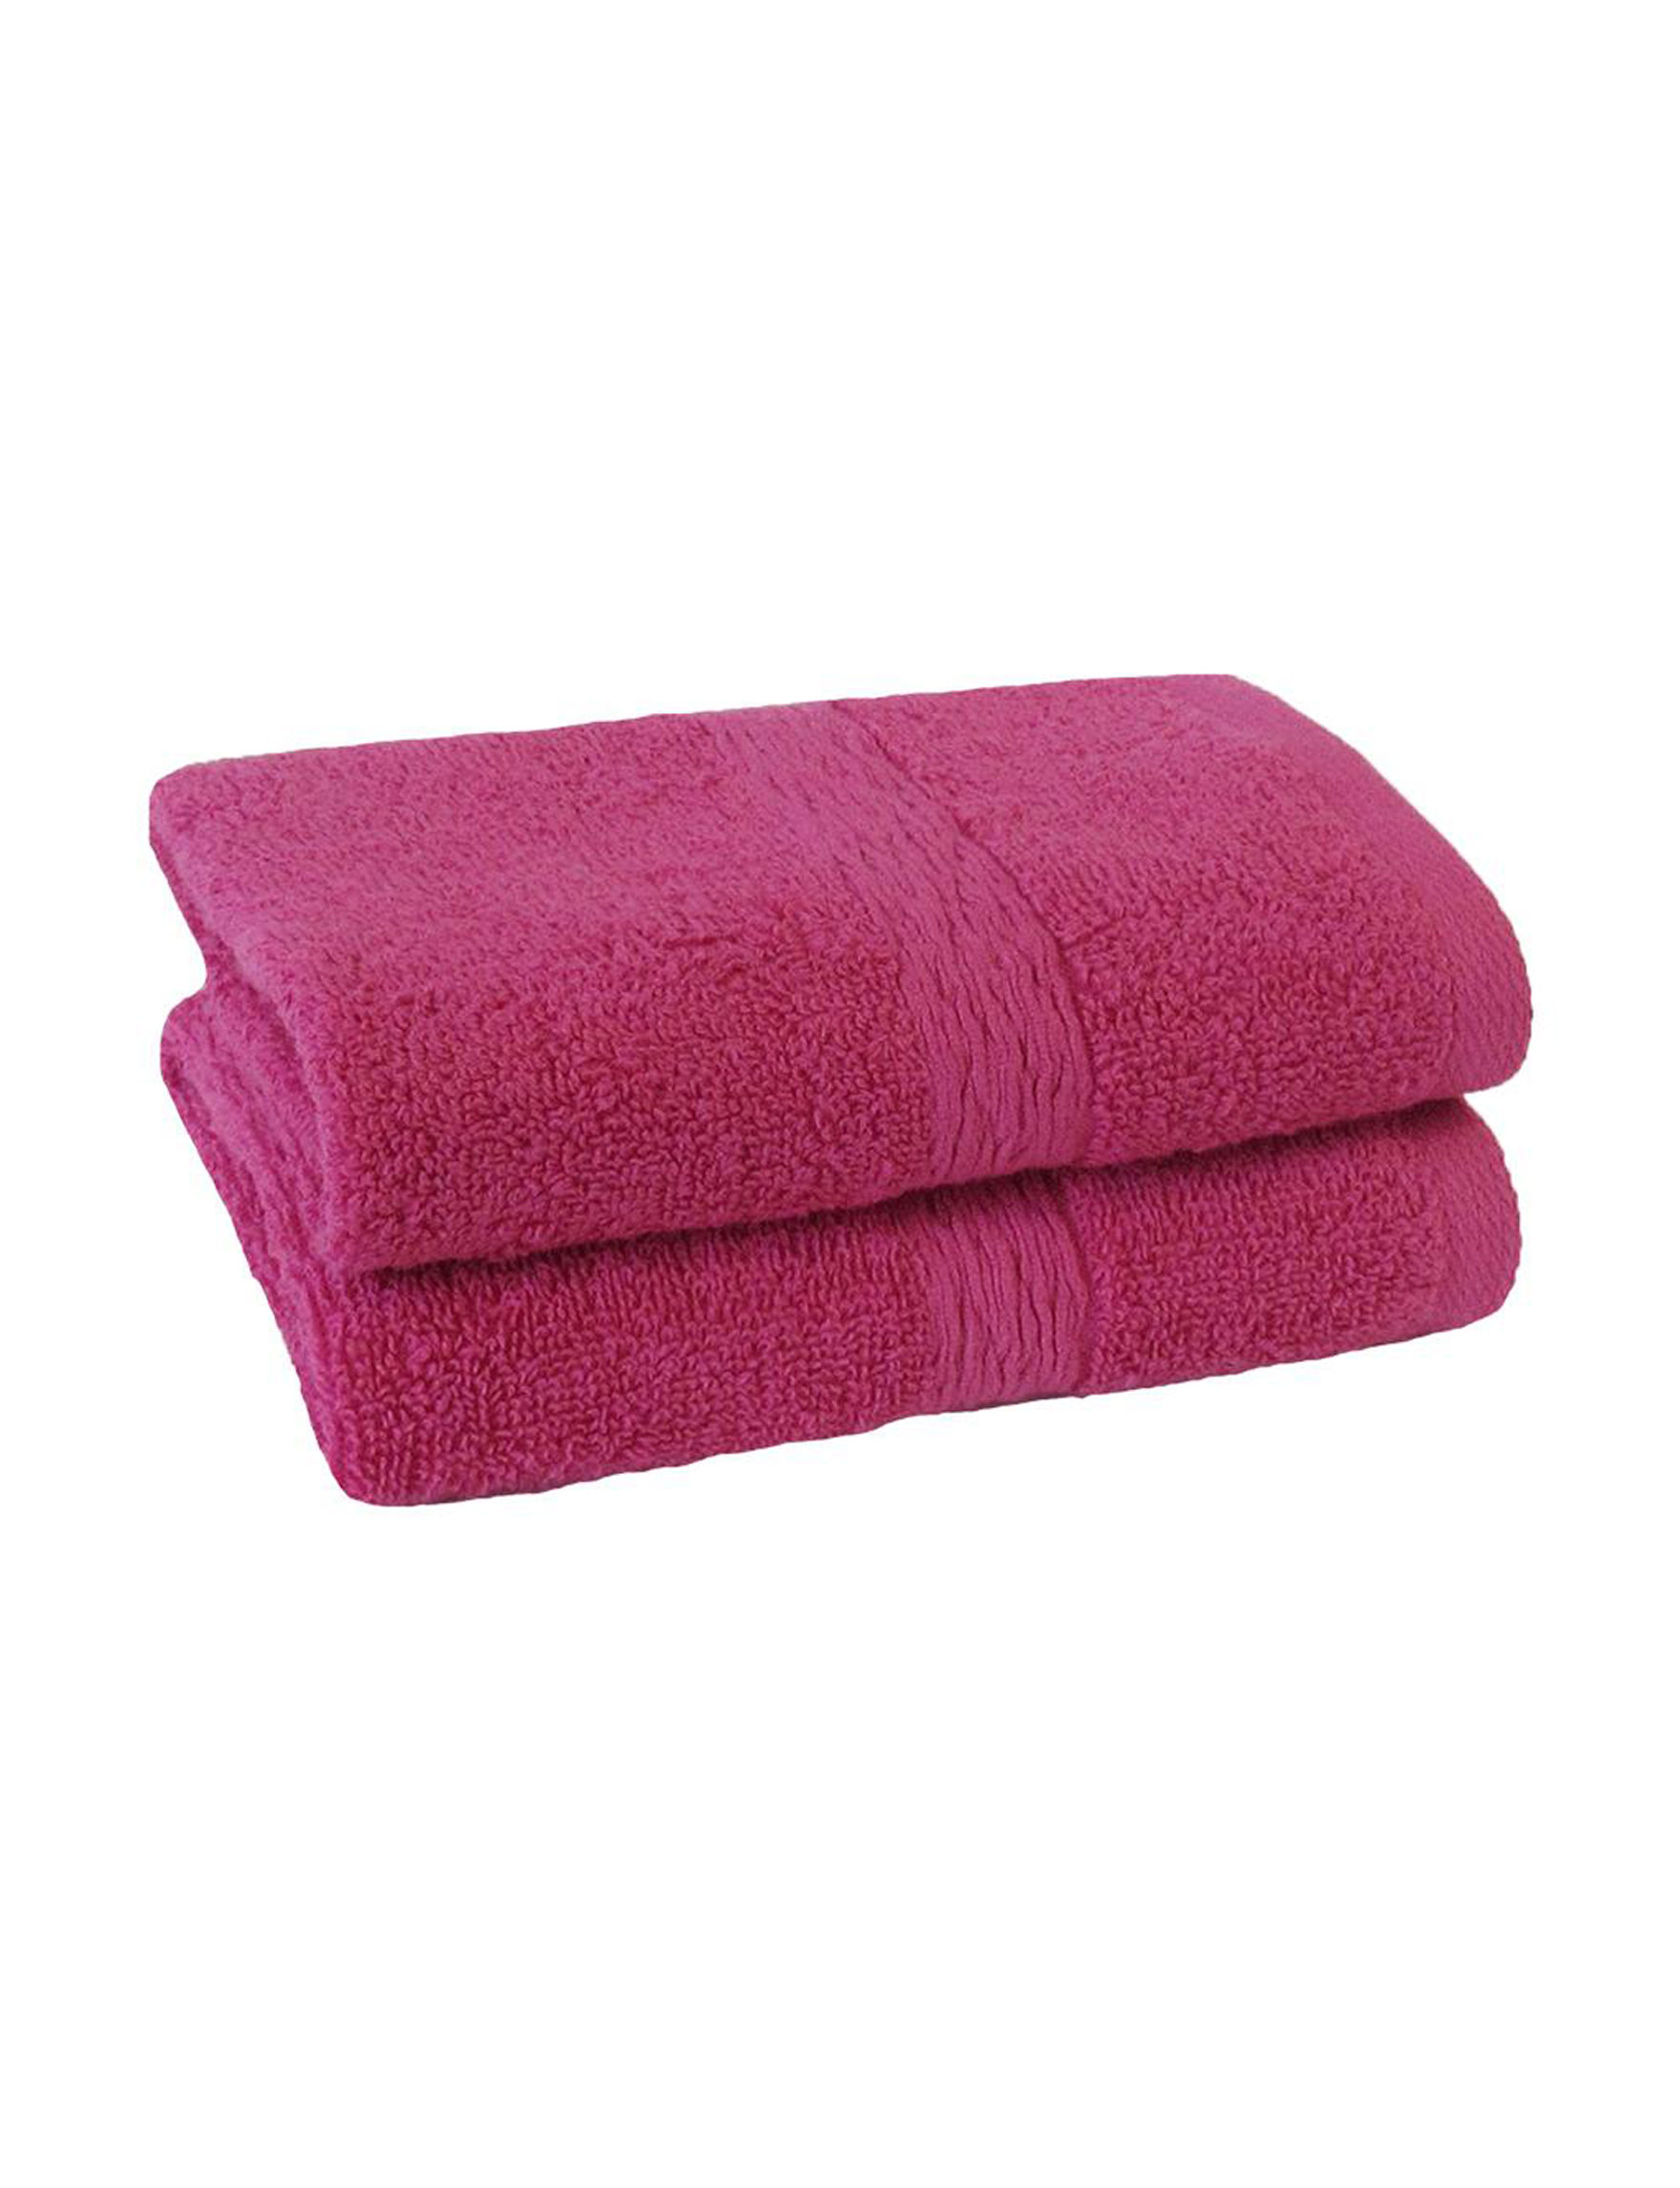 Jessica Simpson Pink Bath Towels